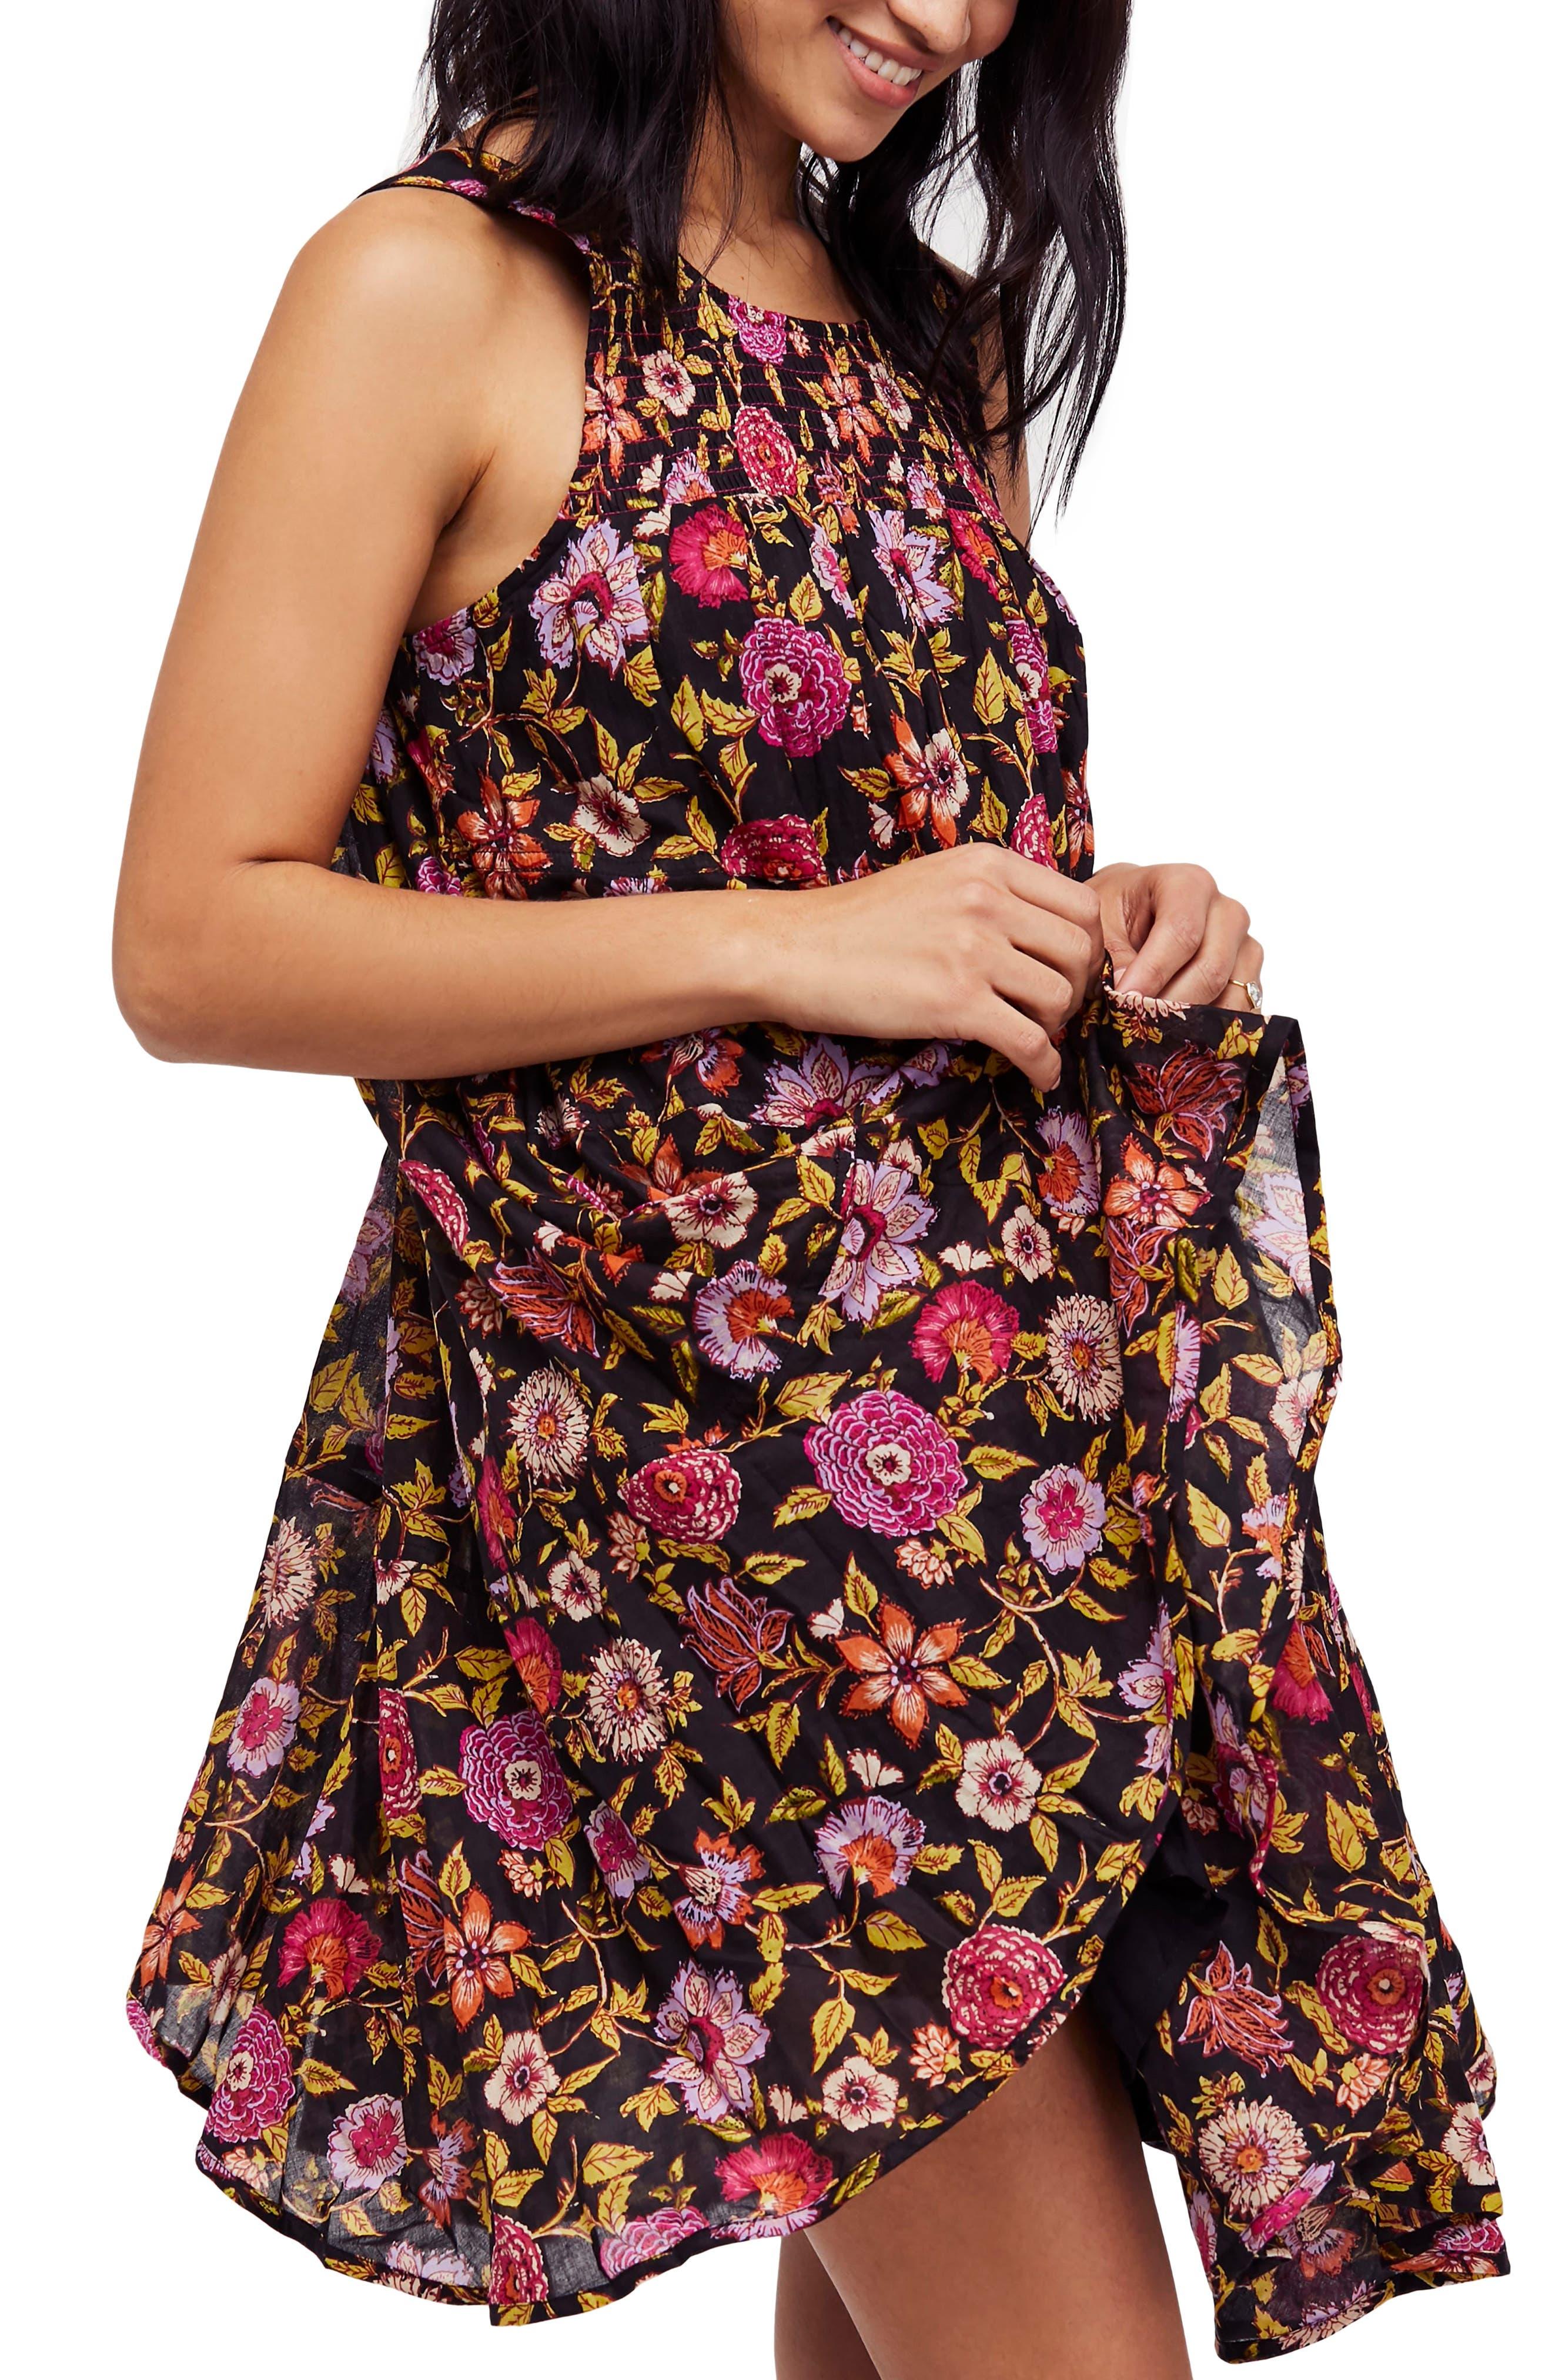 Oh Baby Floral Minidress,                             Main thumbnail 1, color,                             Black